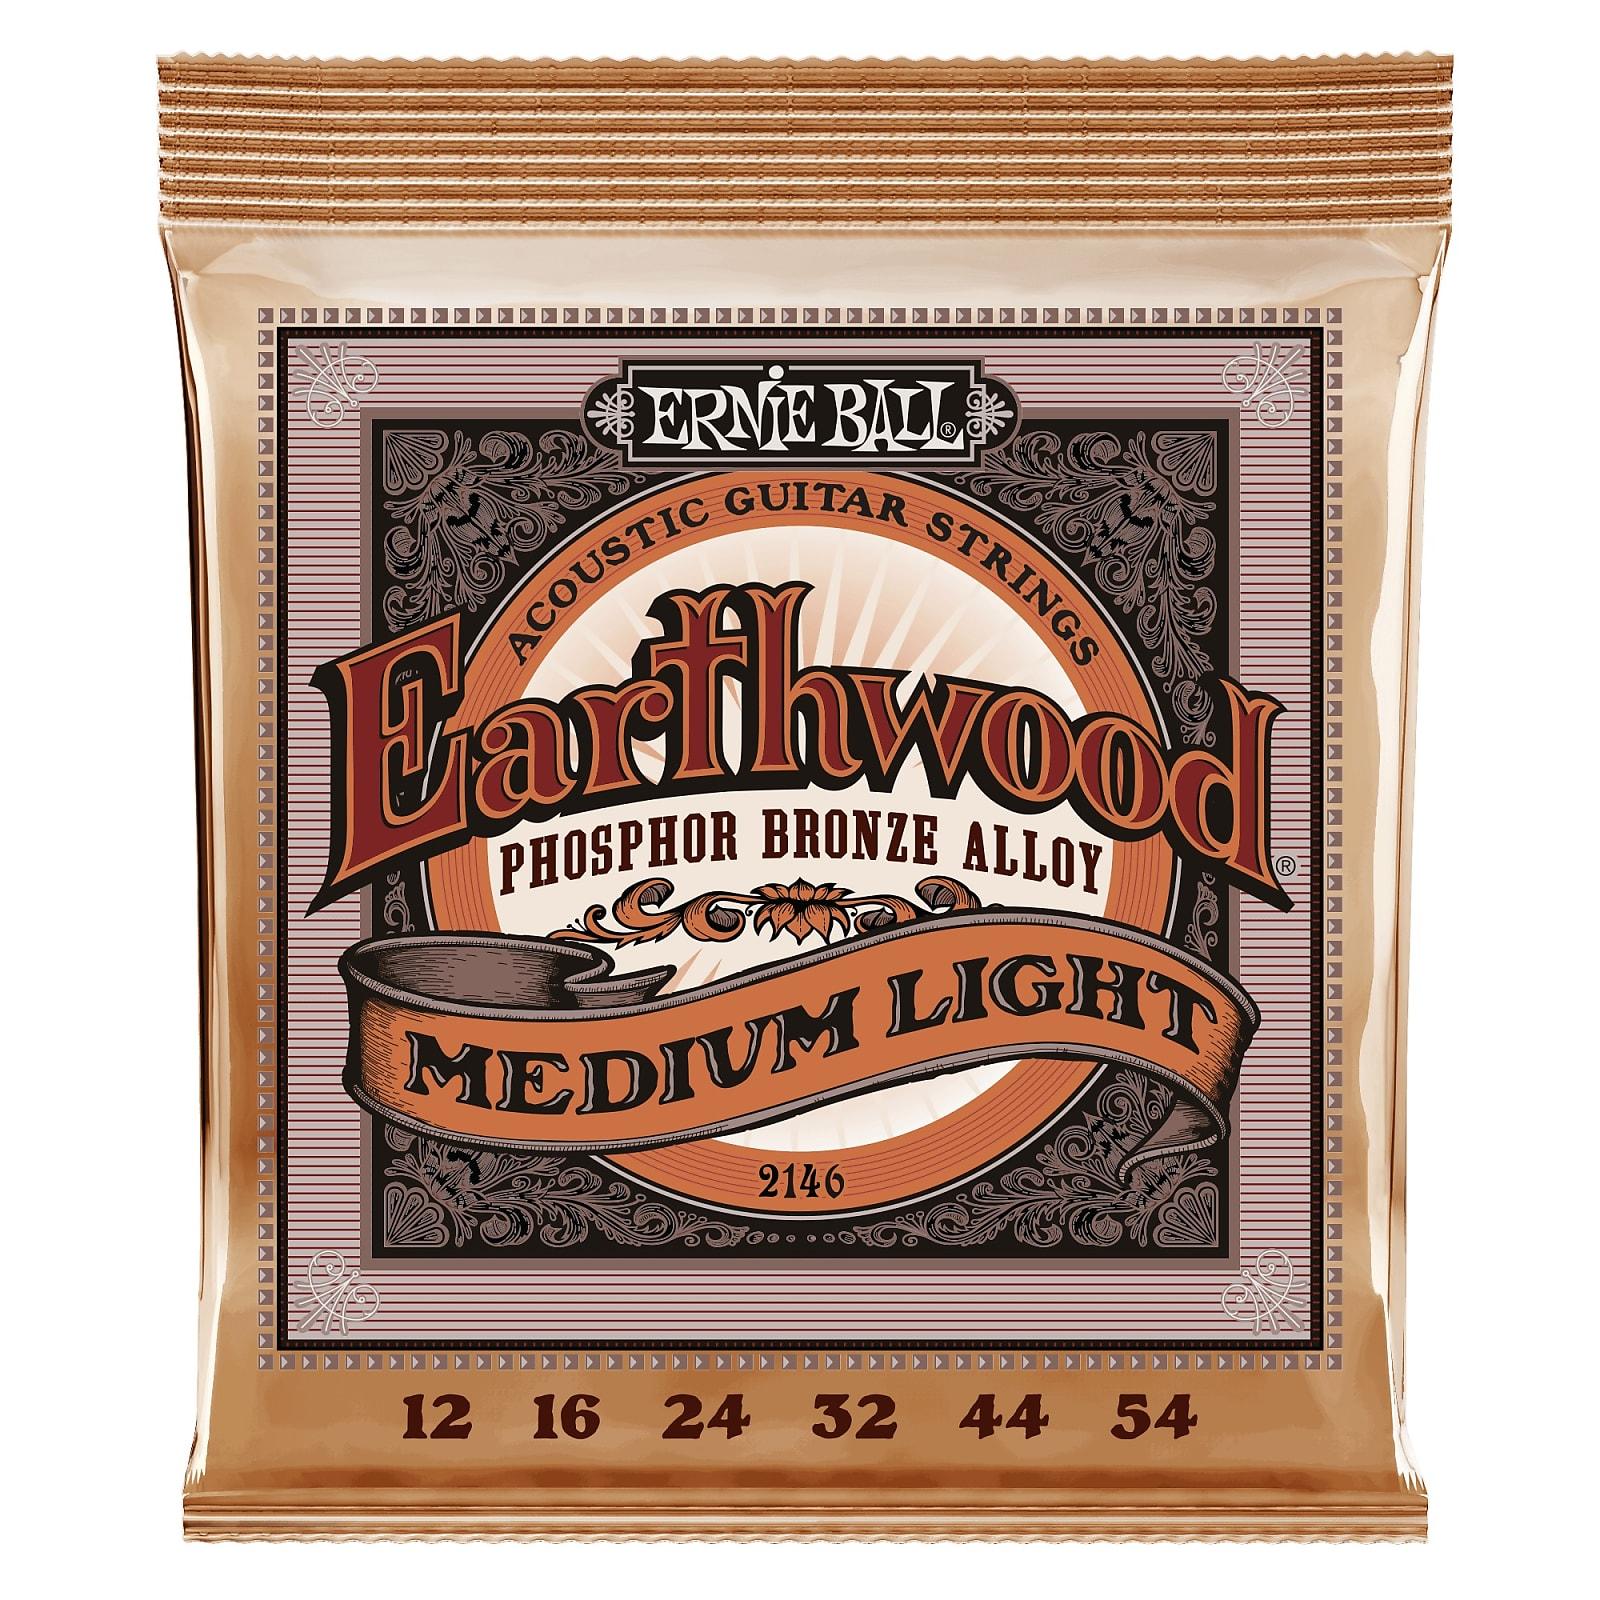 Ernie Ball Earthwood Medium Light Phosphor Bronze Acoustic Guitar Strings - 12-